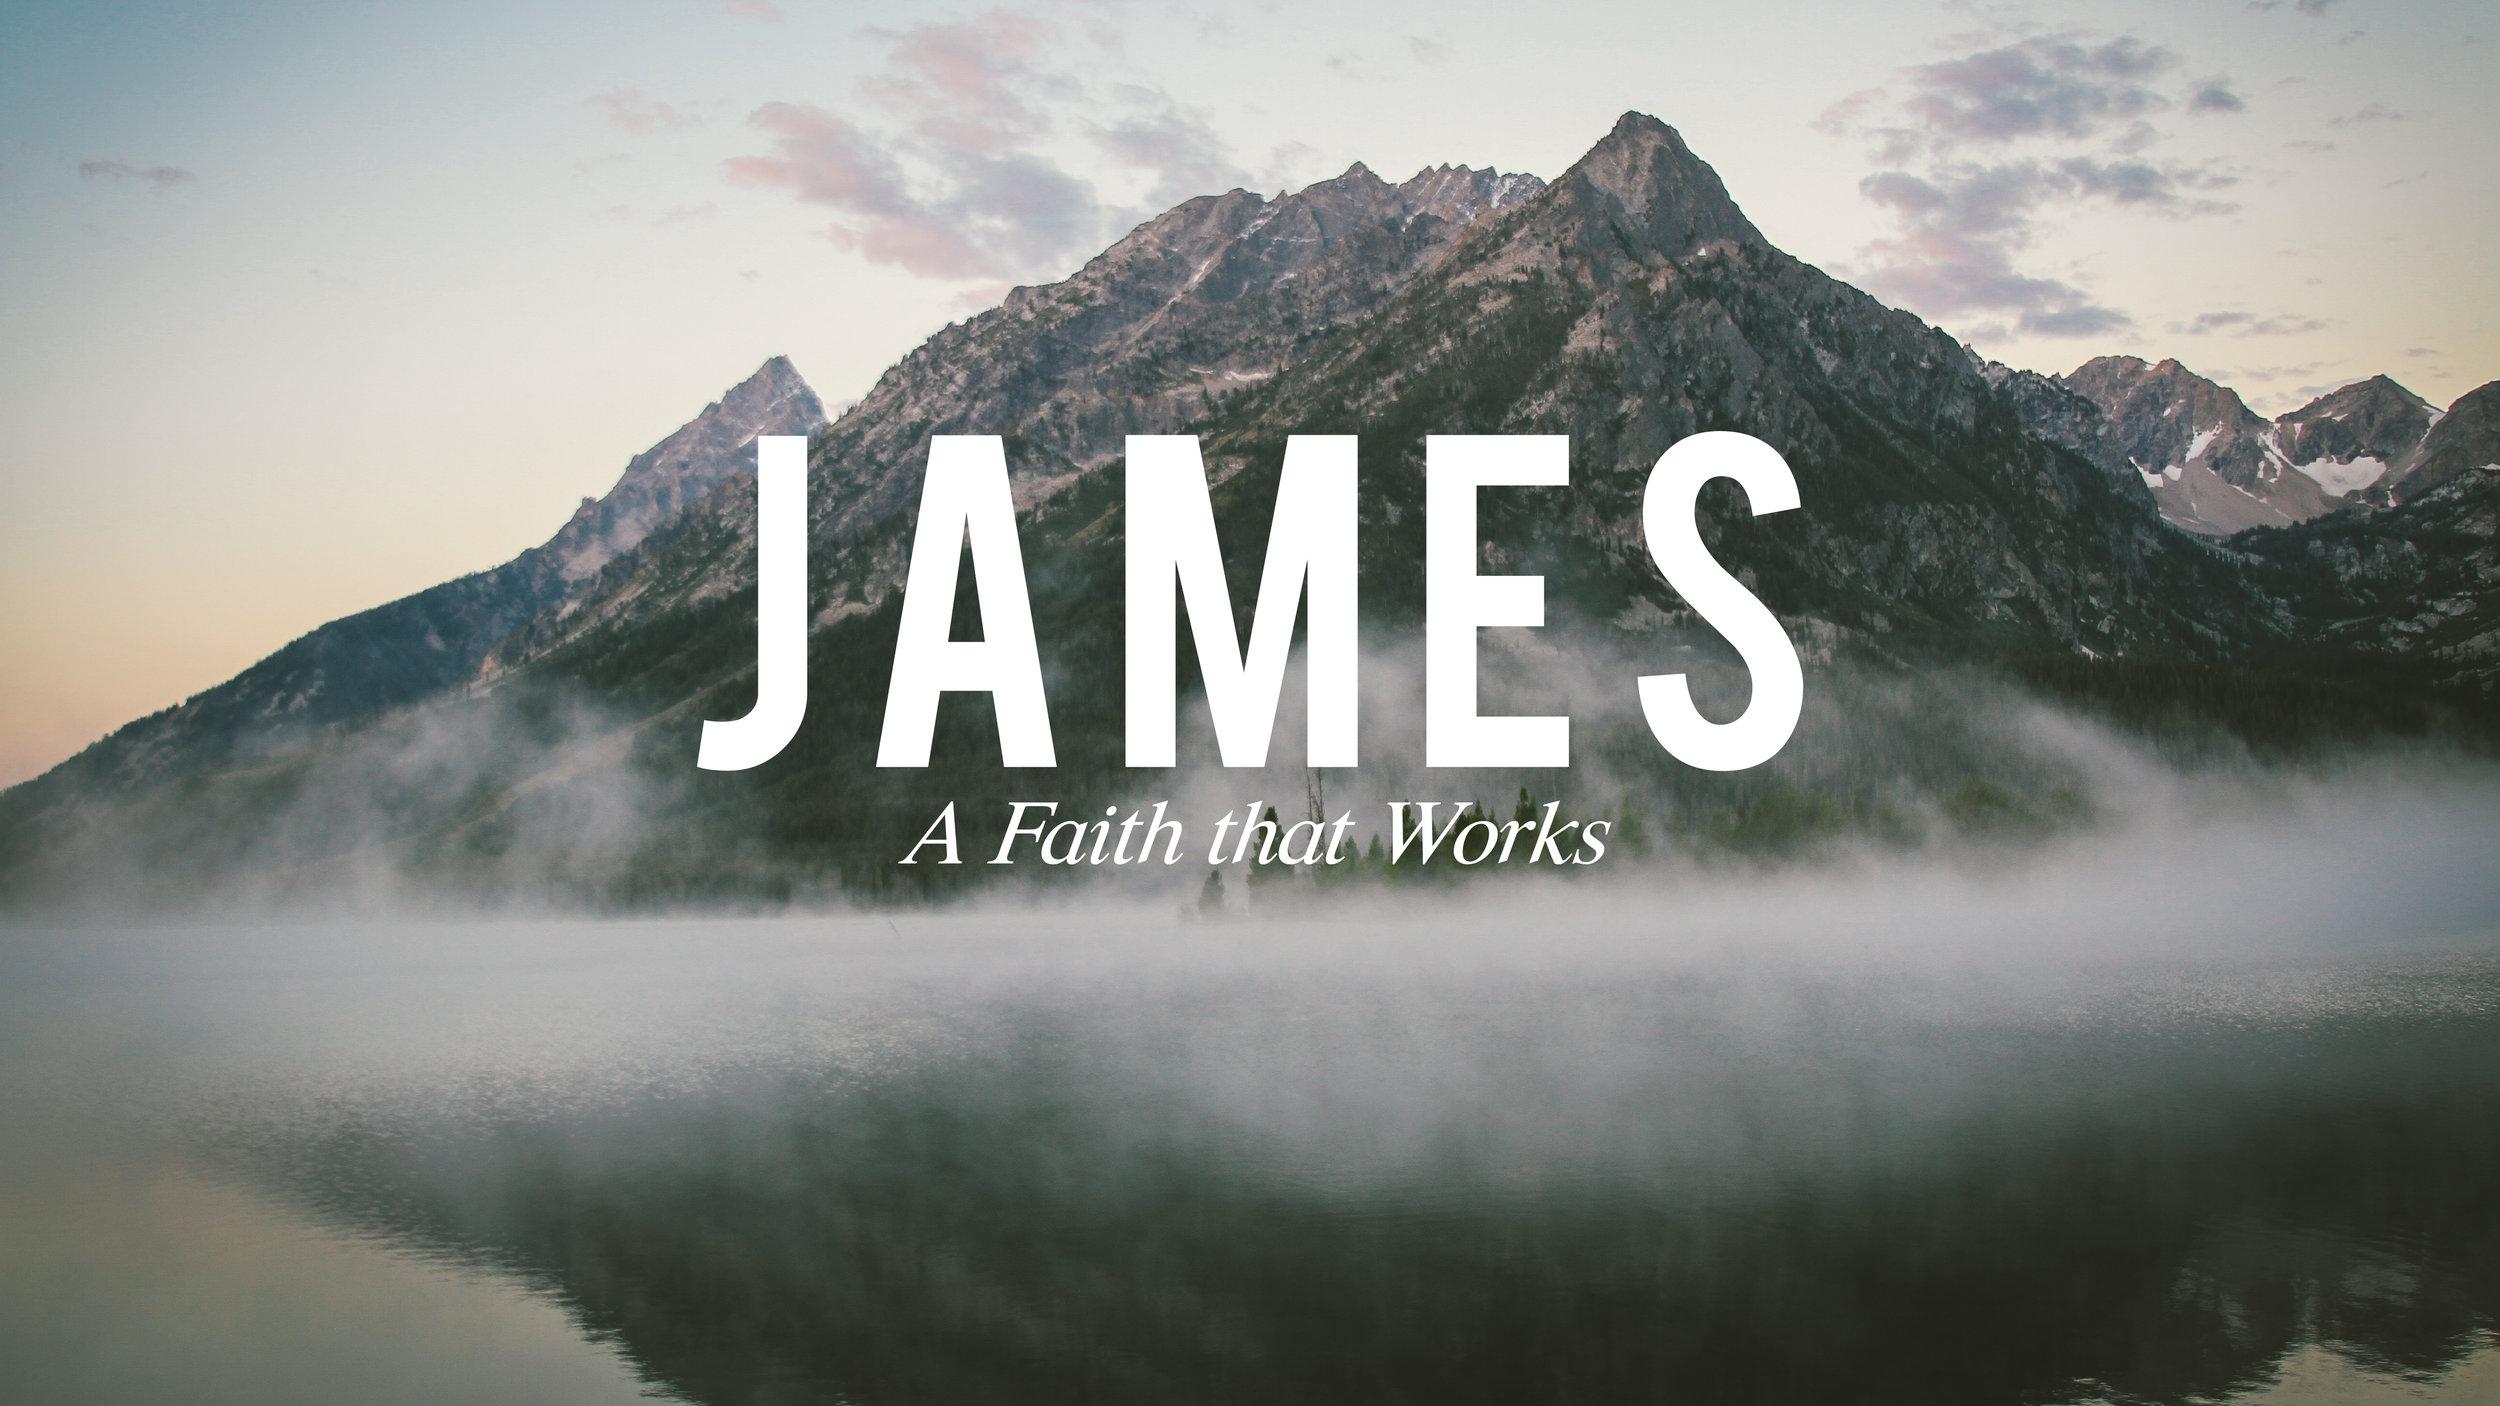 James-01.jpg